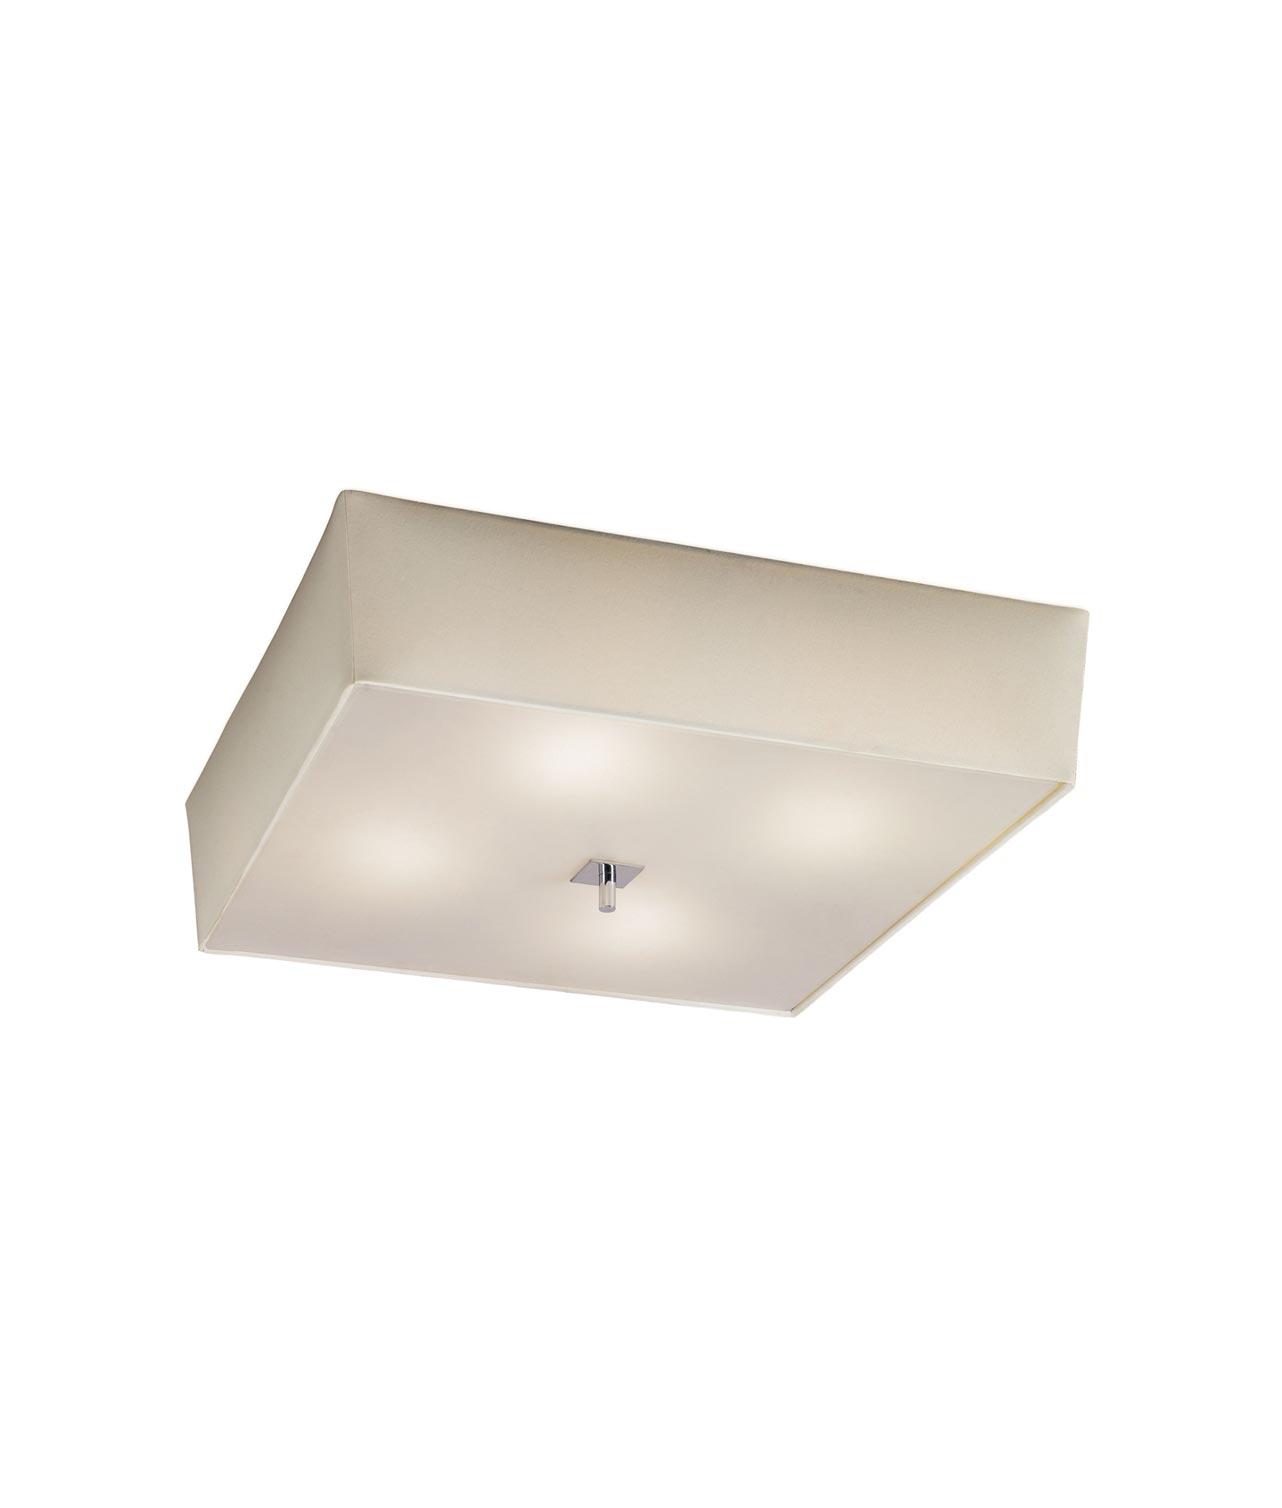 Plafón crema cromo 4 luces AKIRA